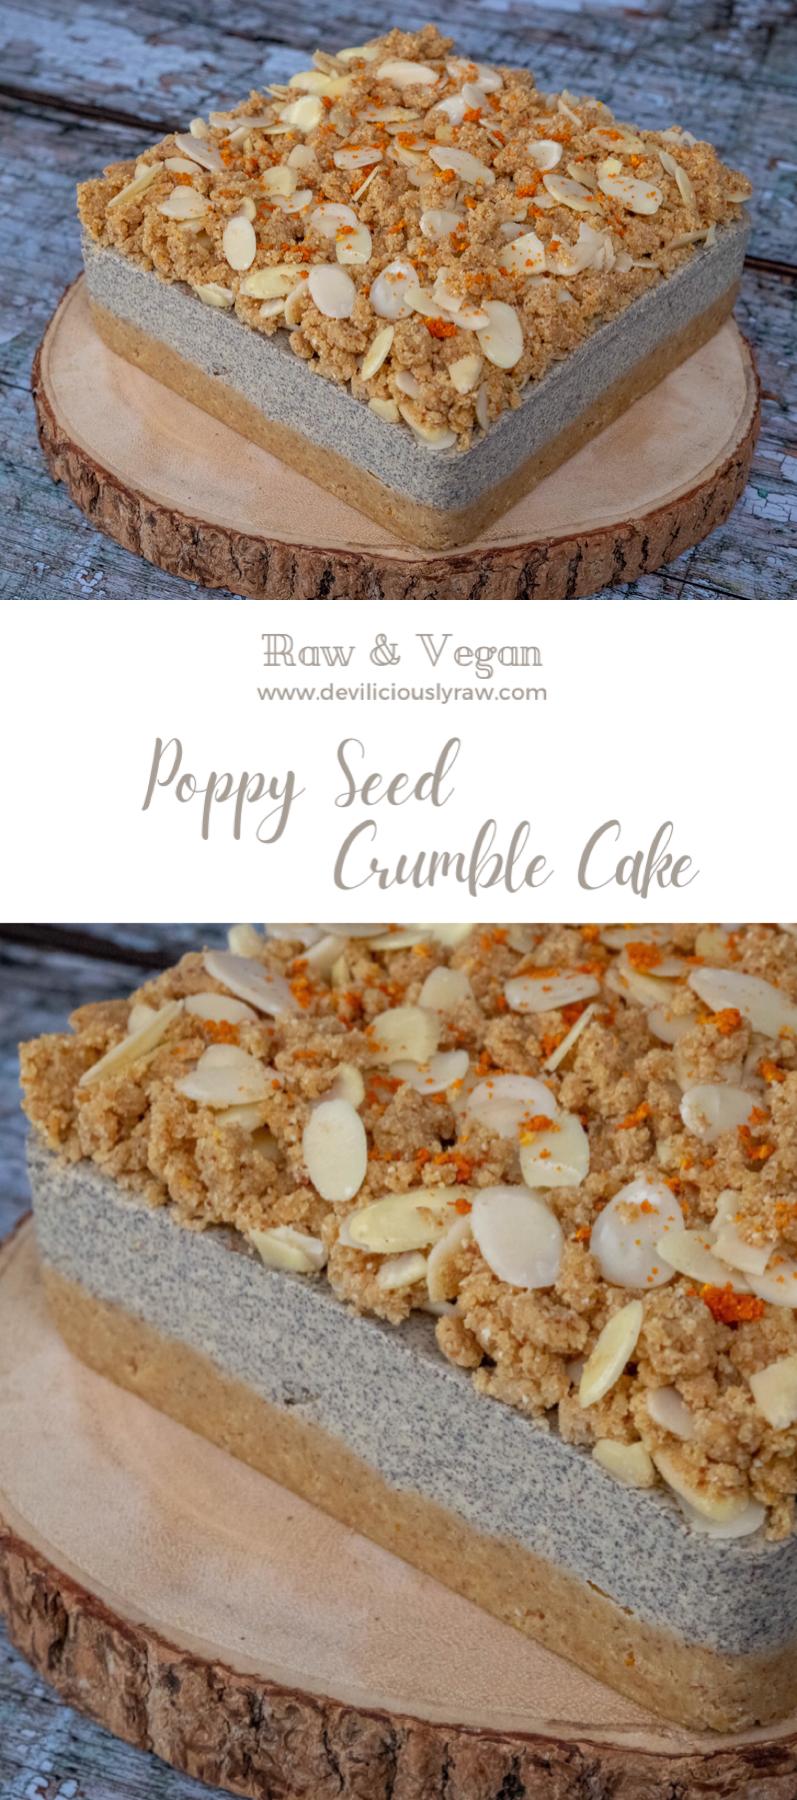 Poppy Seed Crumble Cake